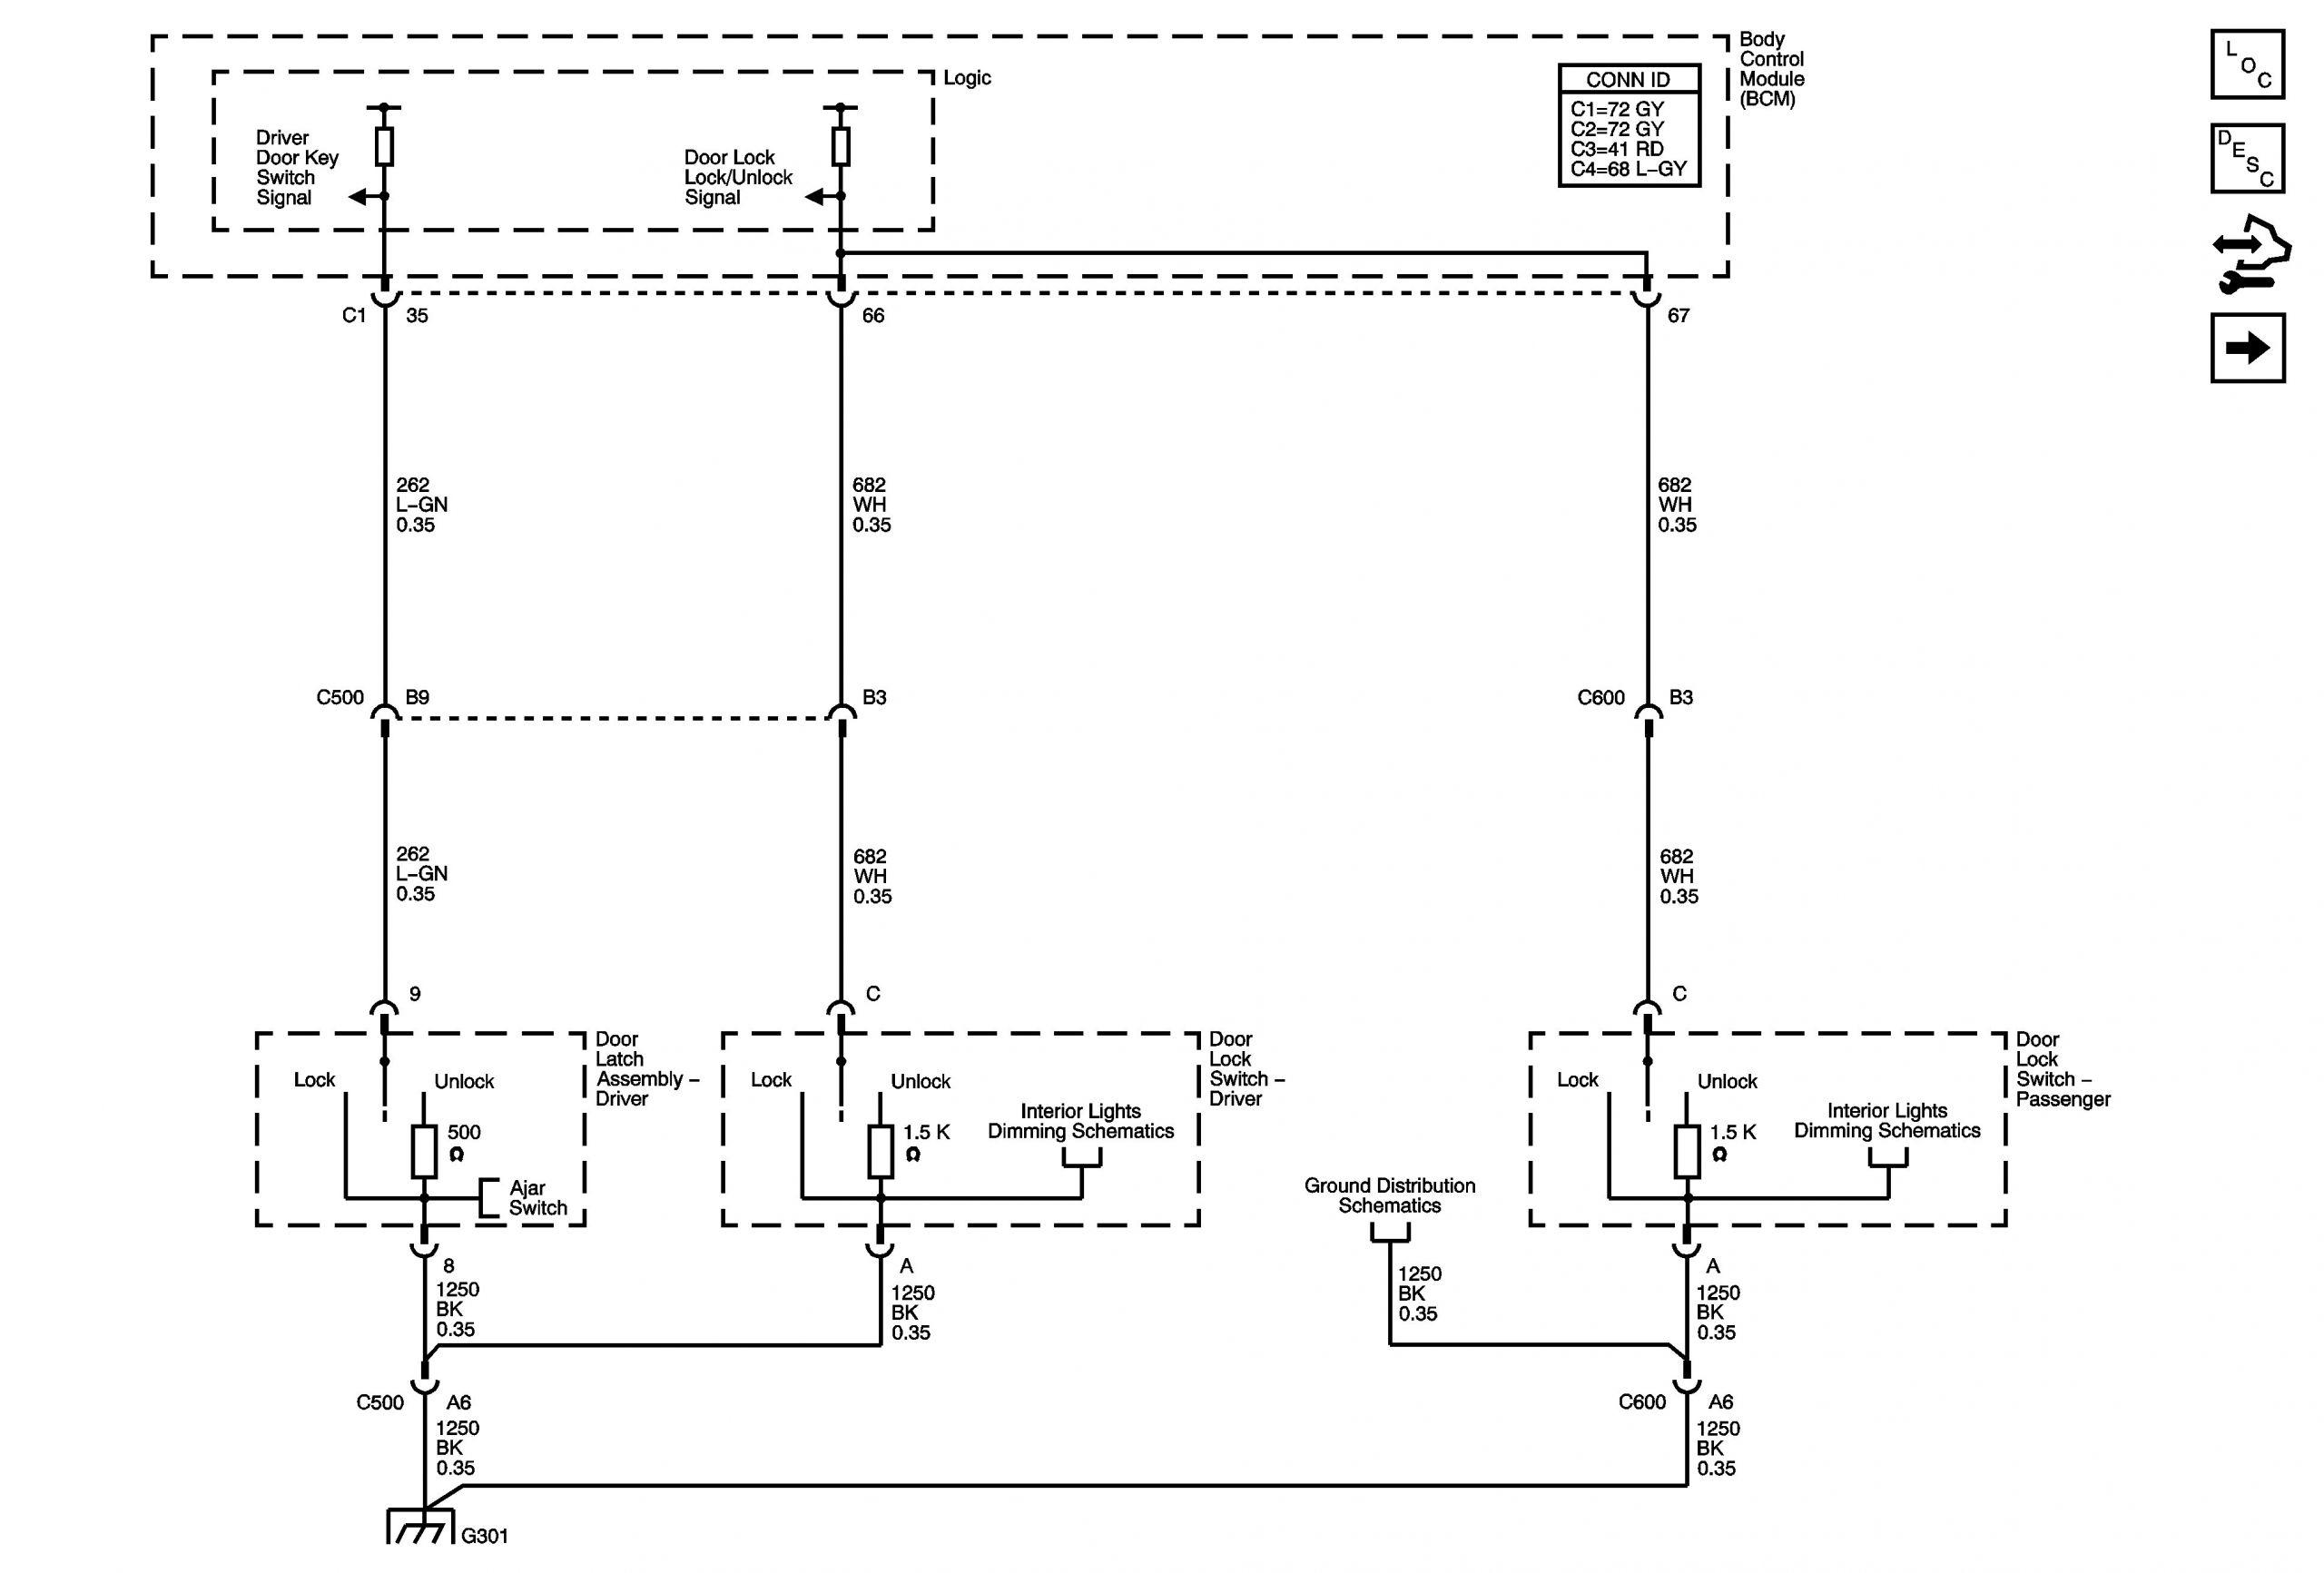 08 Chevy Malibu Starter Wiring Diagram 2008 Malibu Starter Circuit Schematic